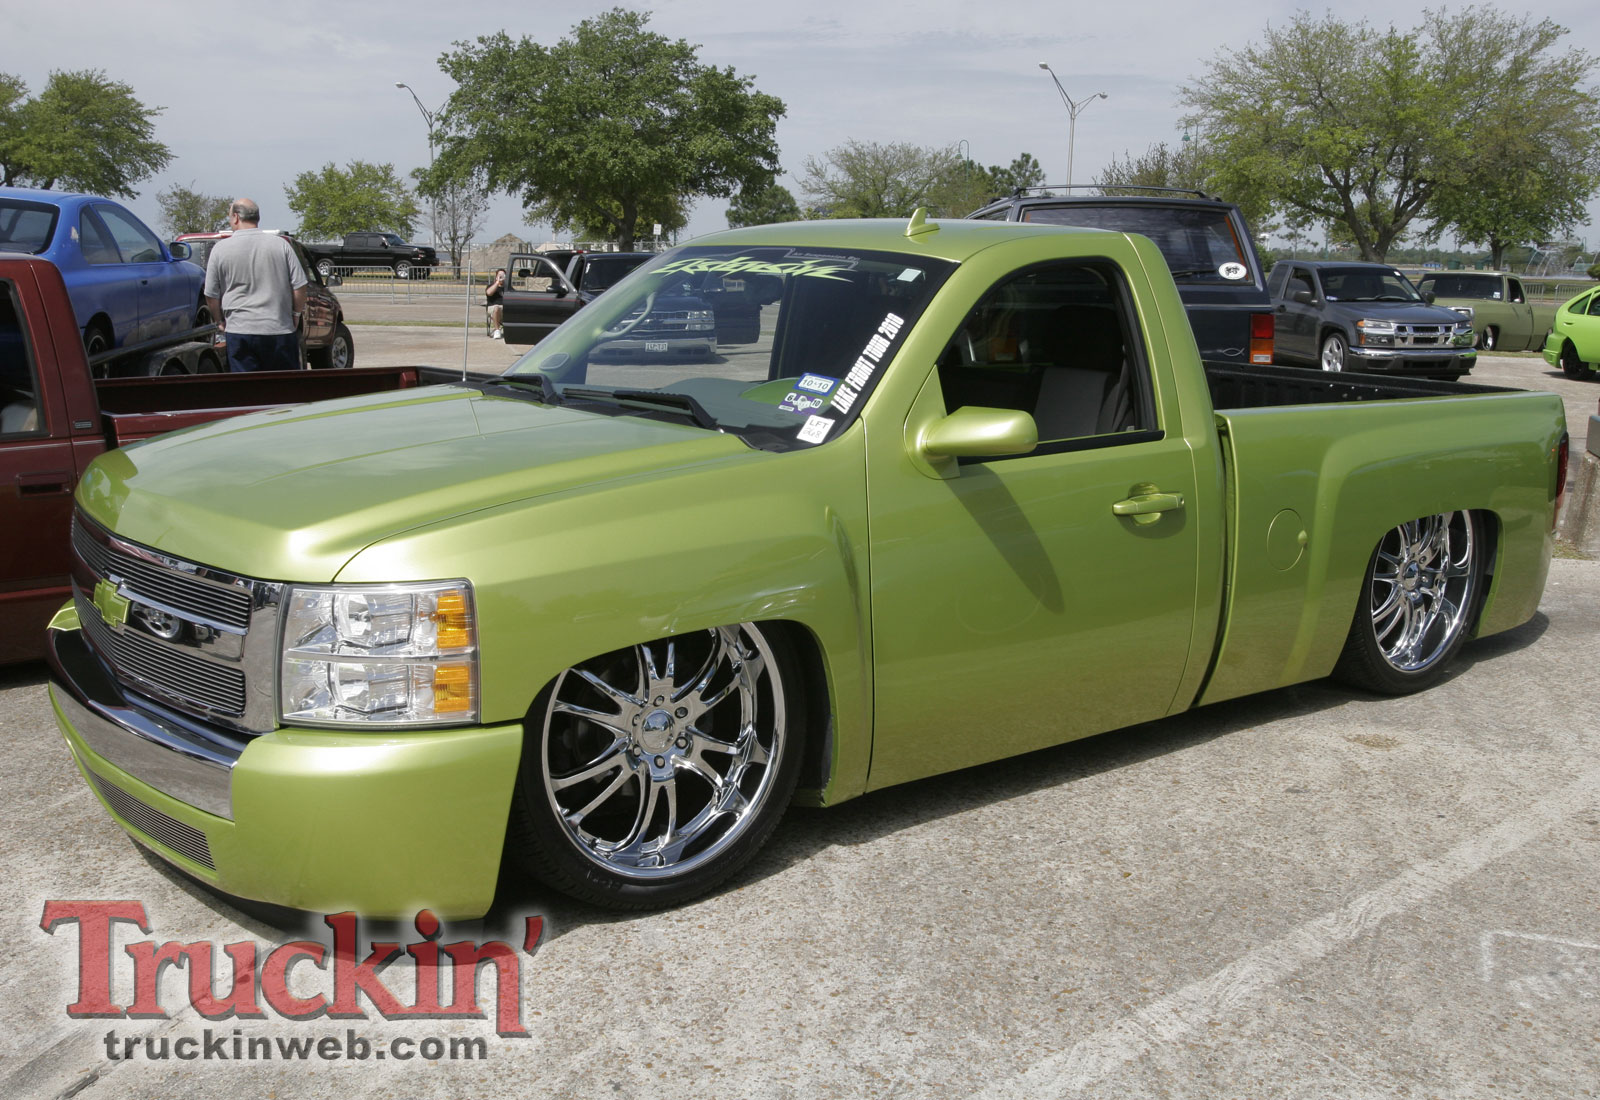 1004trweb_15+2010_midnight_fantasies_truck_show+custom_green_chevy_silverado.jpg